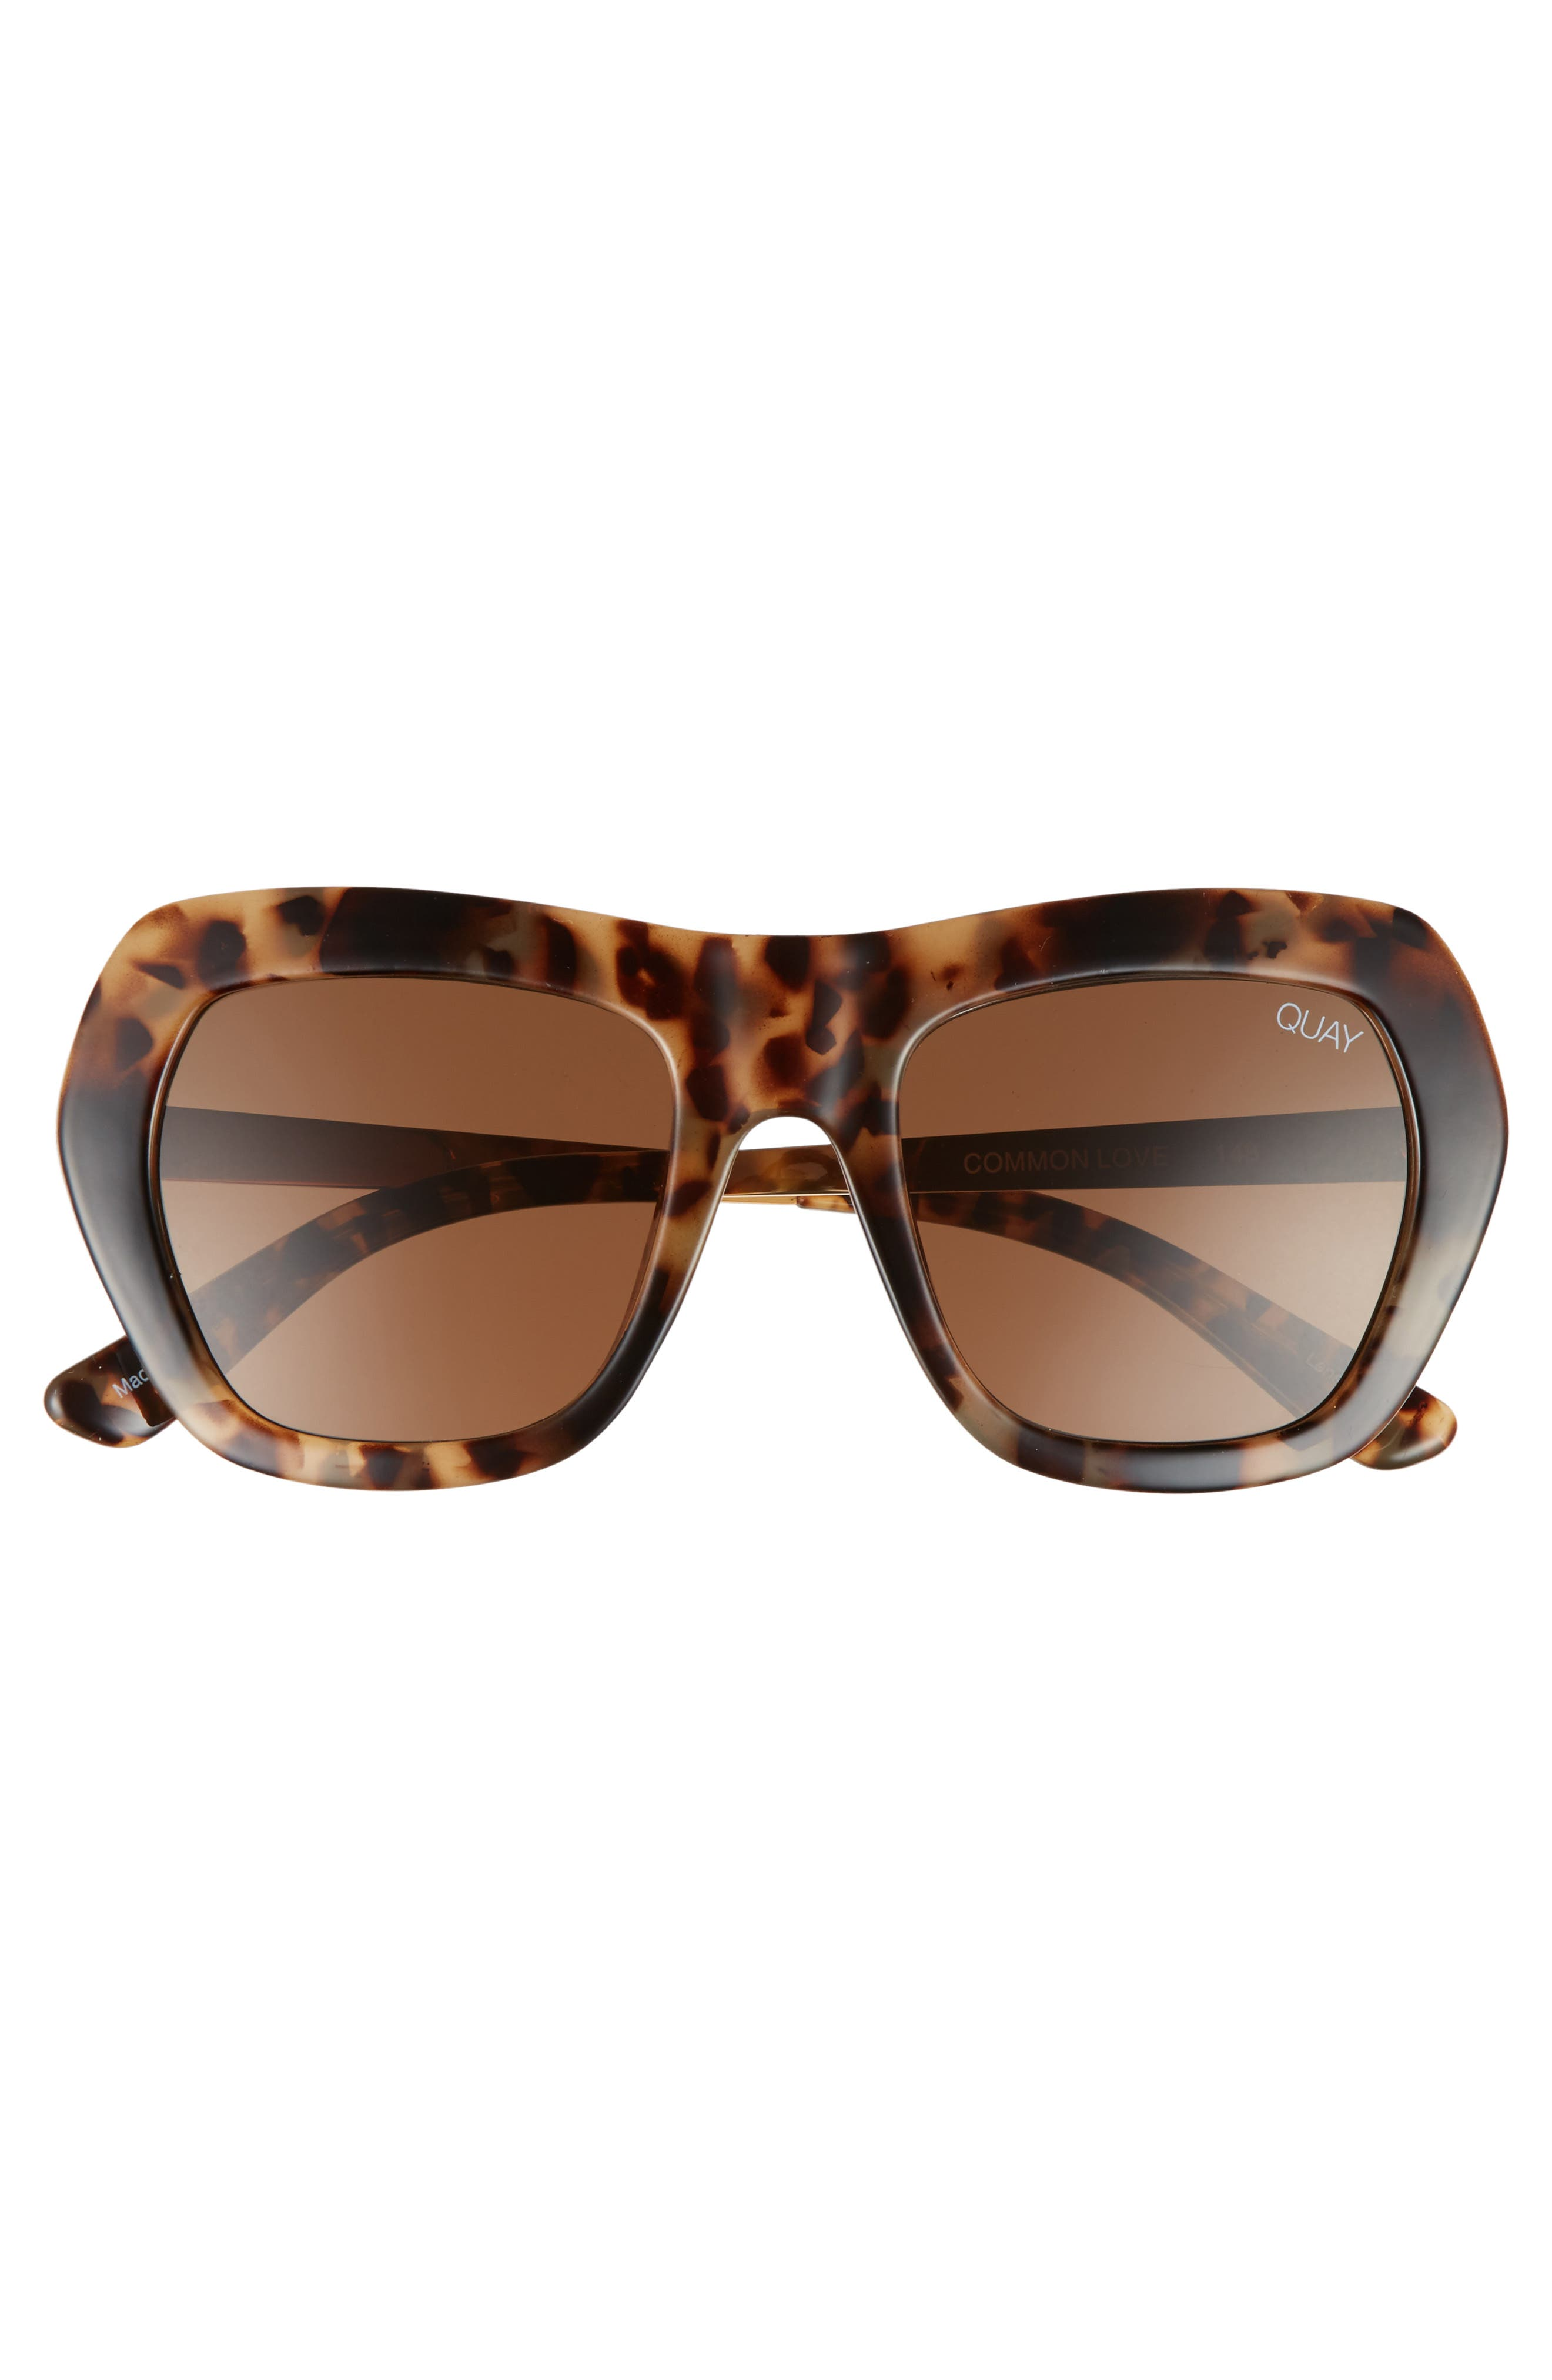 Common Love 53mm Square Sunglasses,                             Alternate thumbnail 6, color,